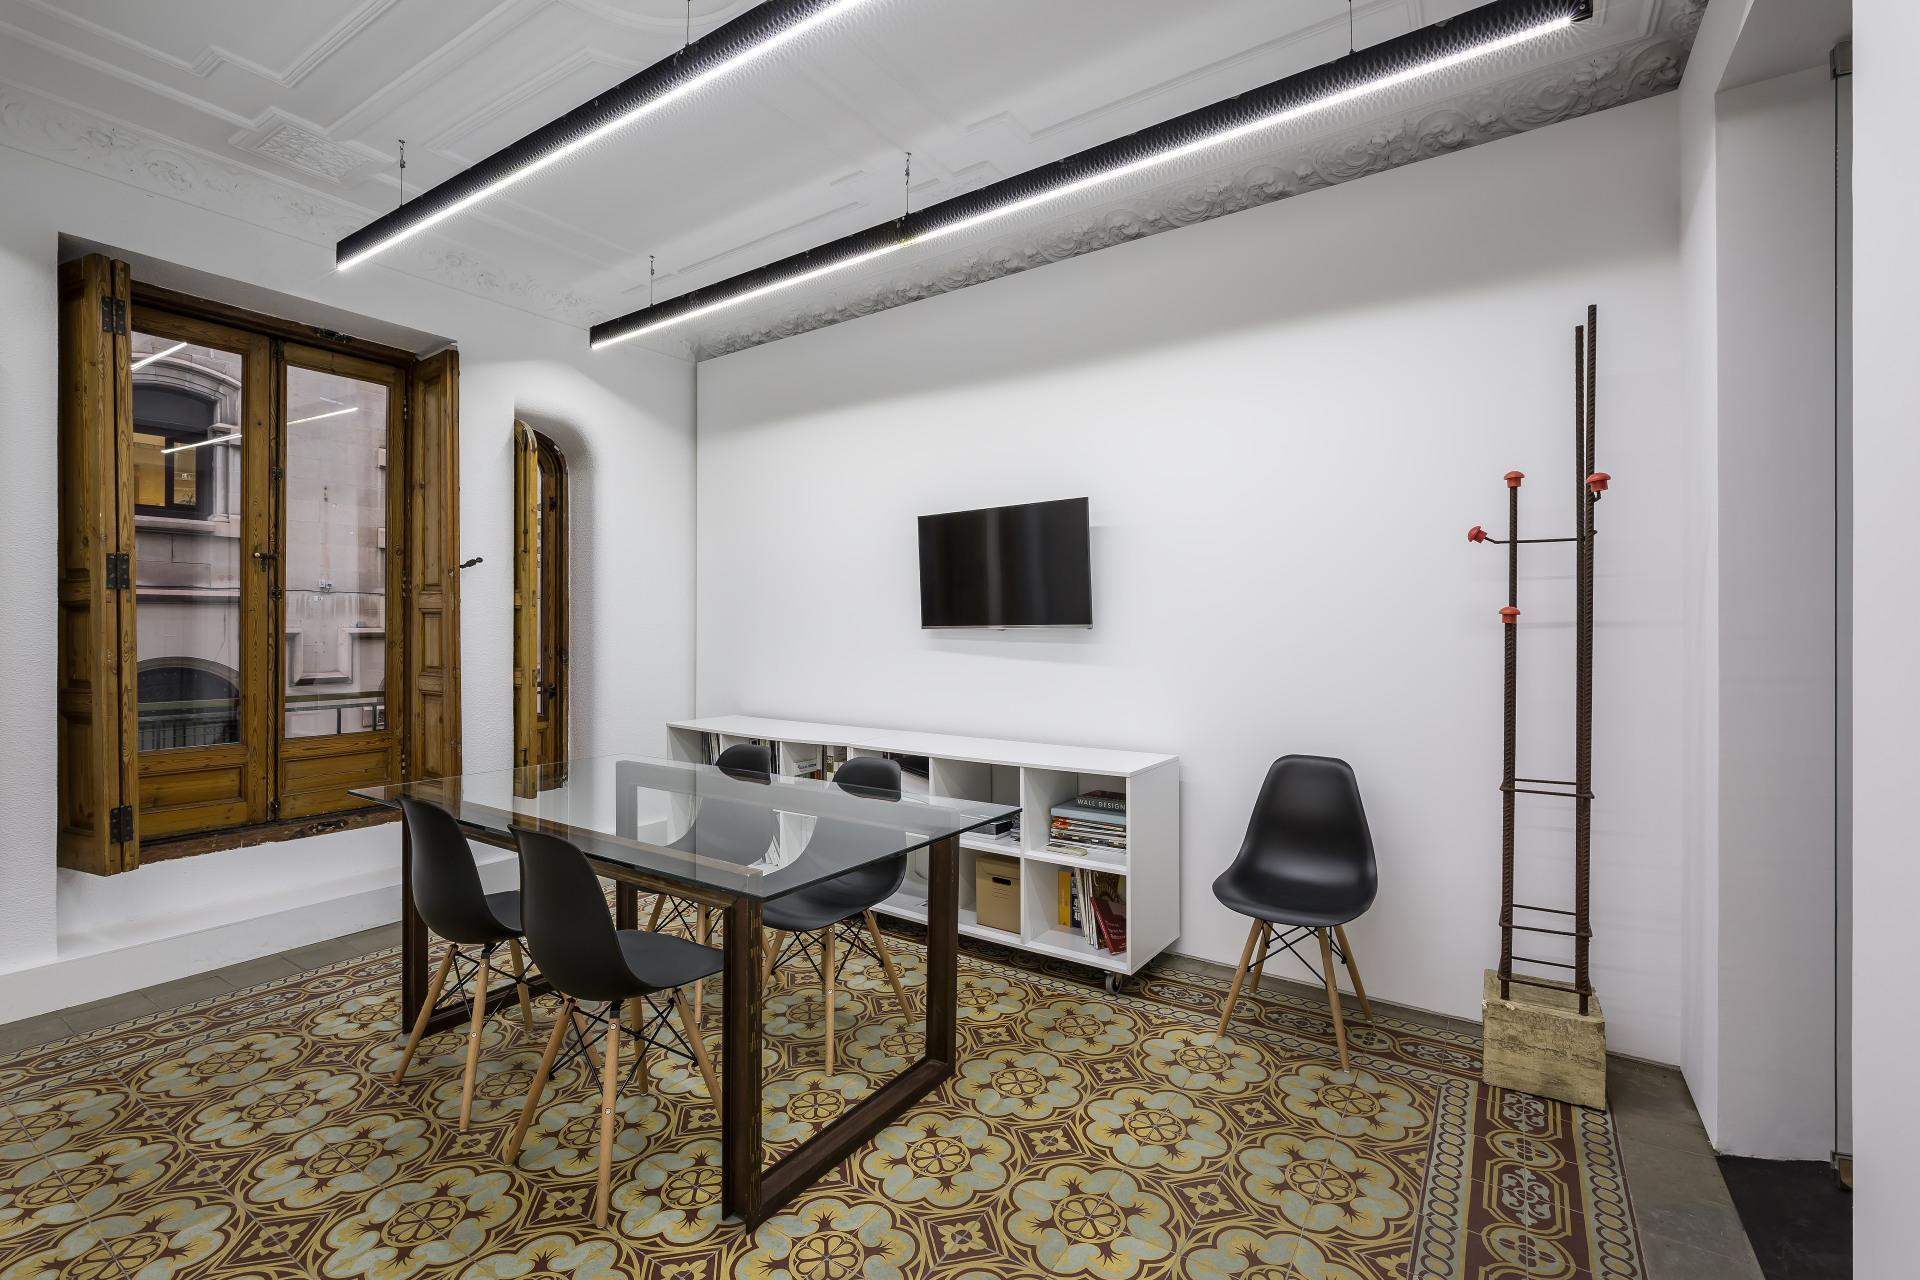 fotografia-arquitectura-interiorismo-valencia-german-cabo-viraje-estudio-pujol (14)